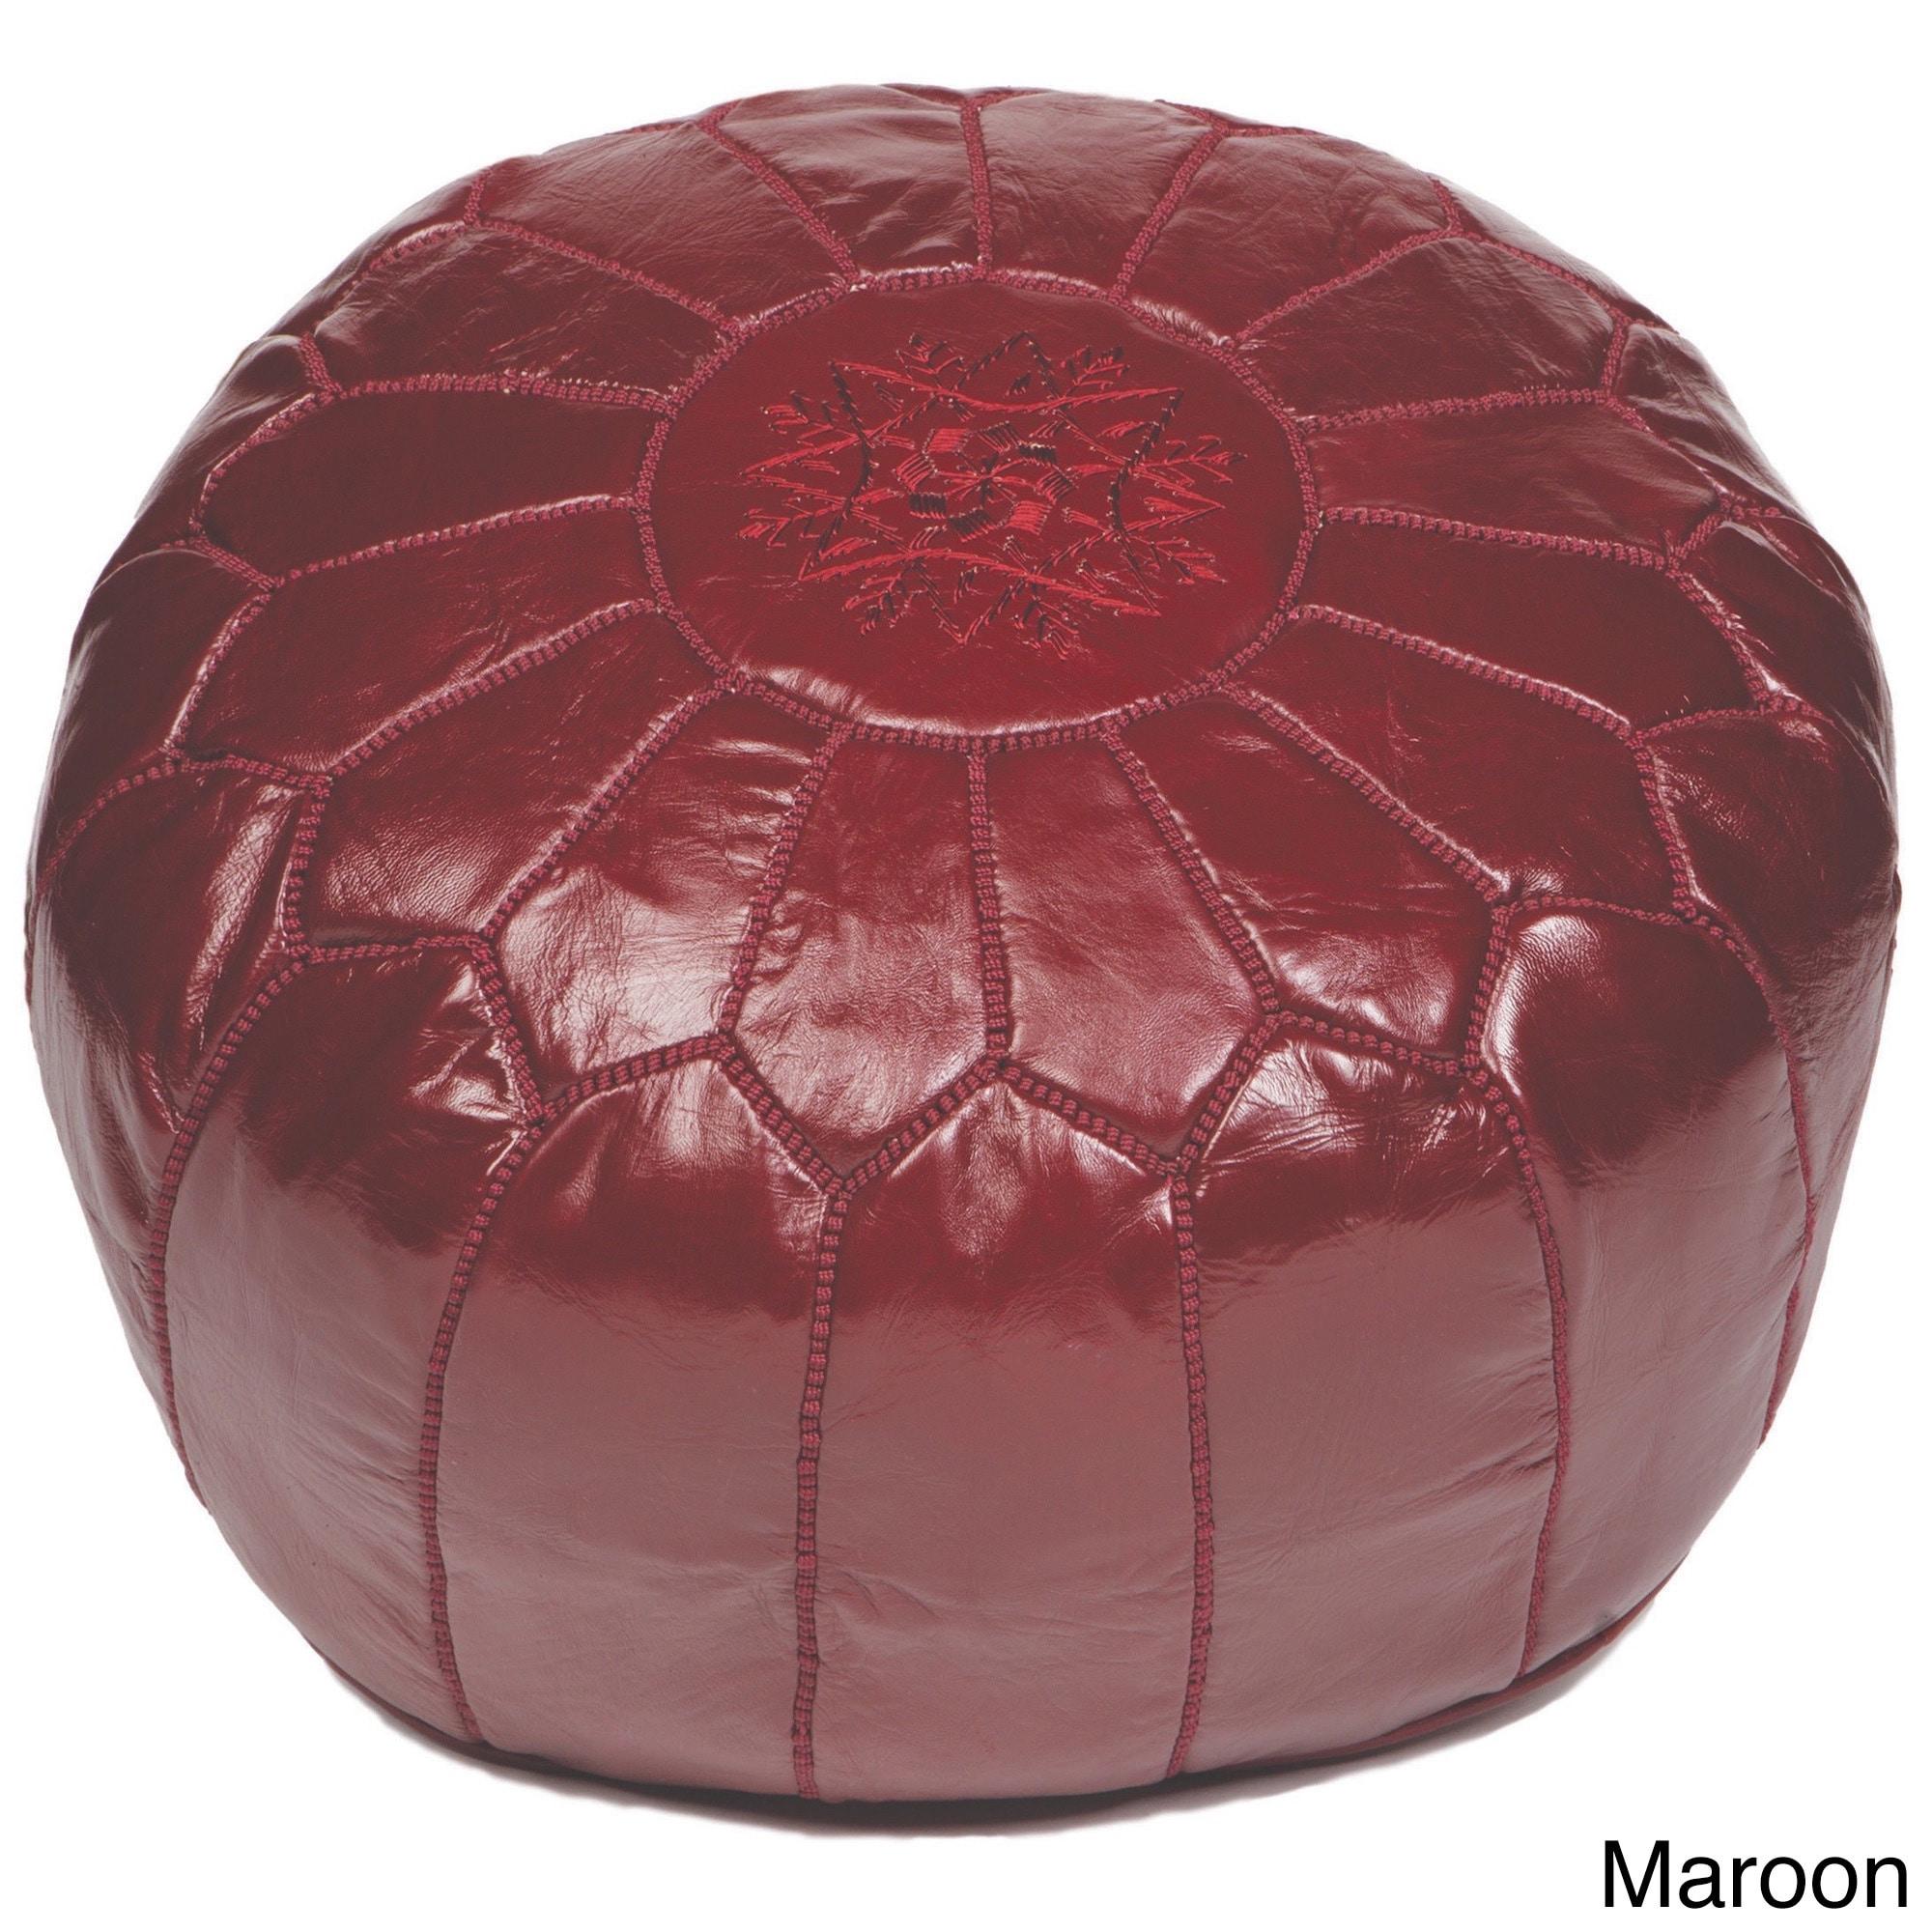 Handmade Moroccan Leather Pouf Ottoman (Morocco) (Maroon)...